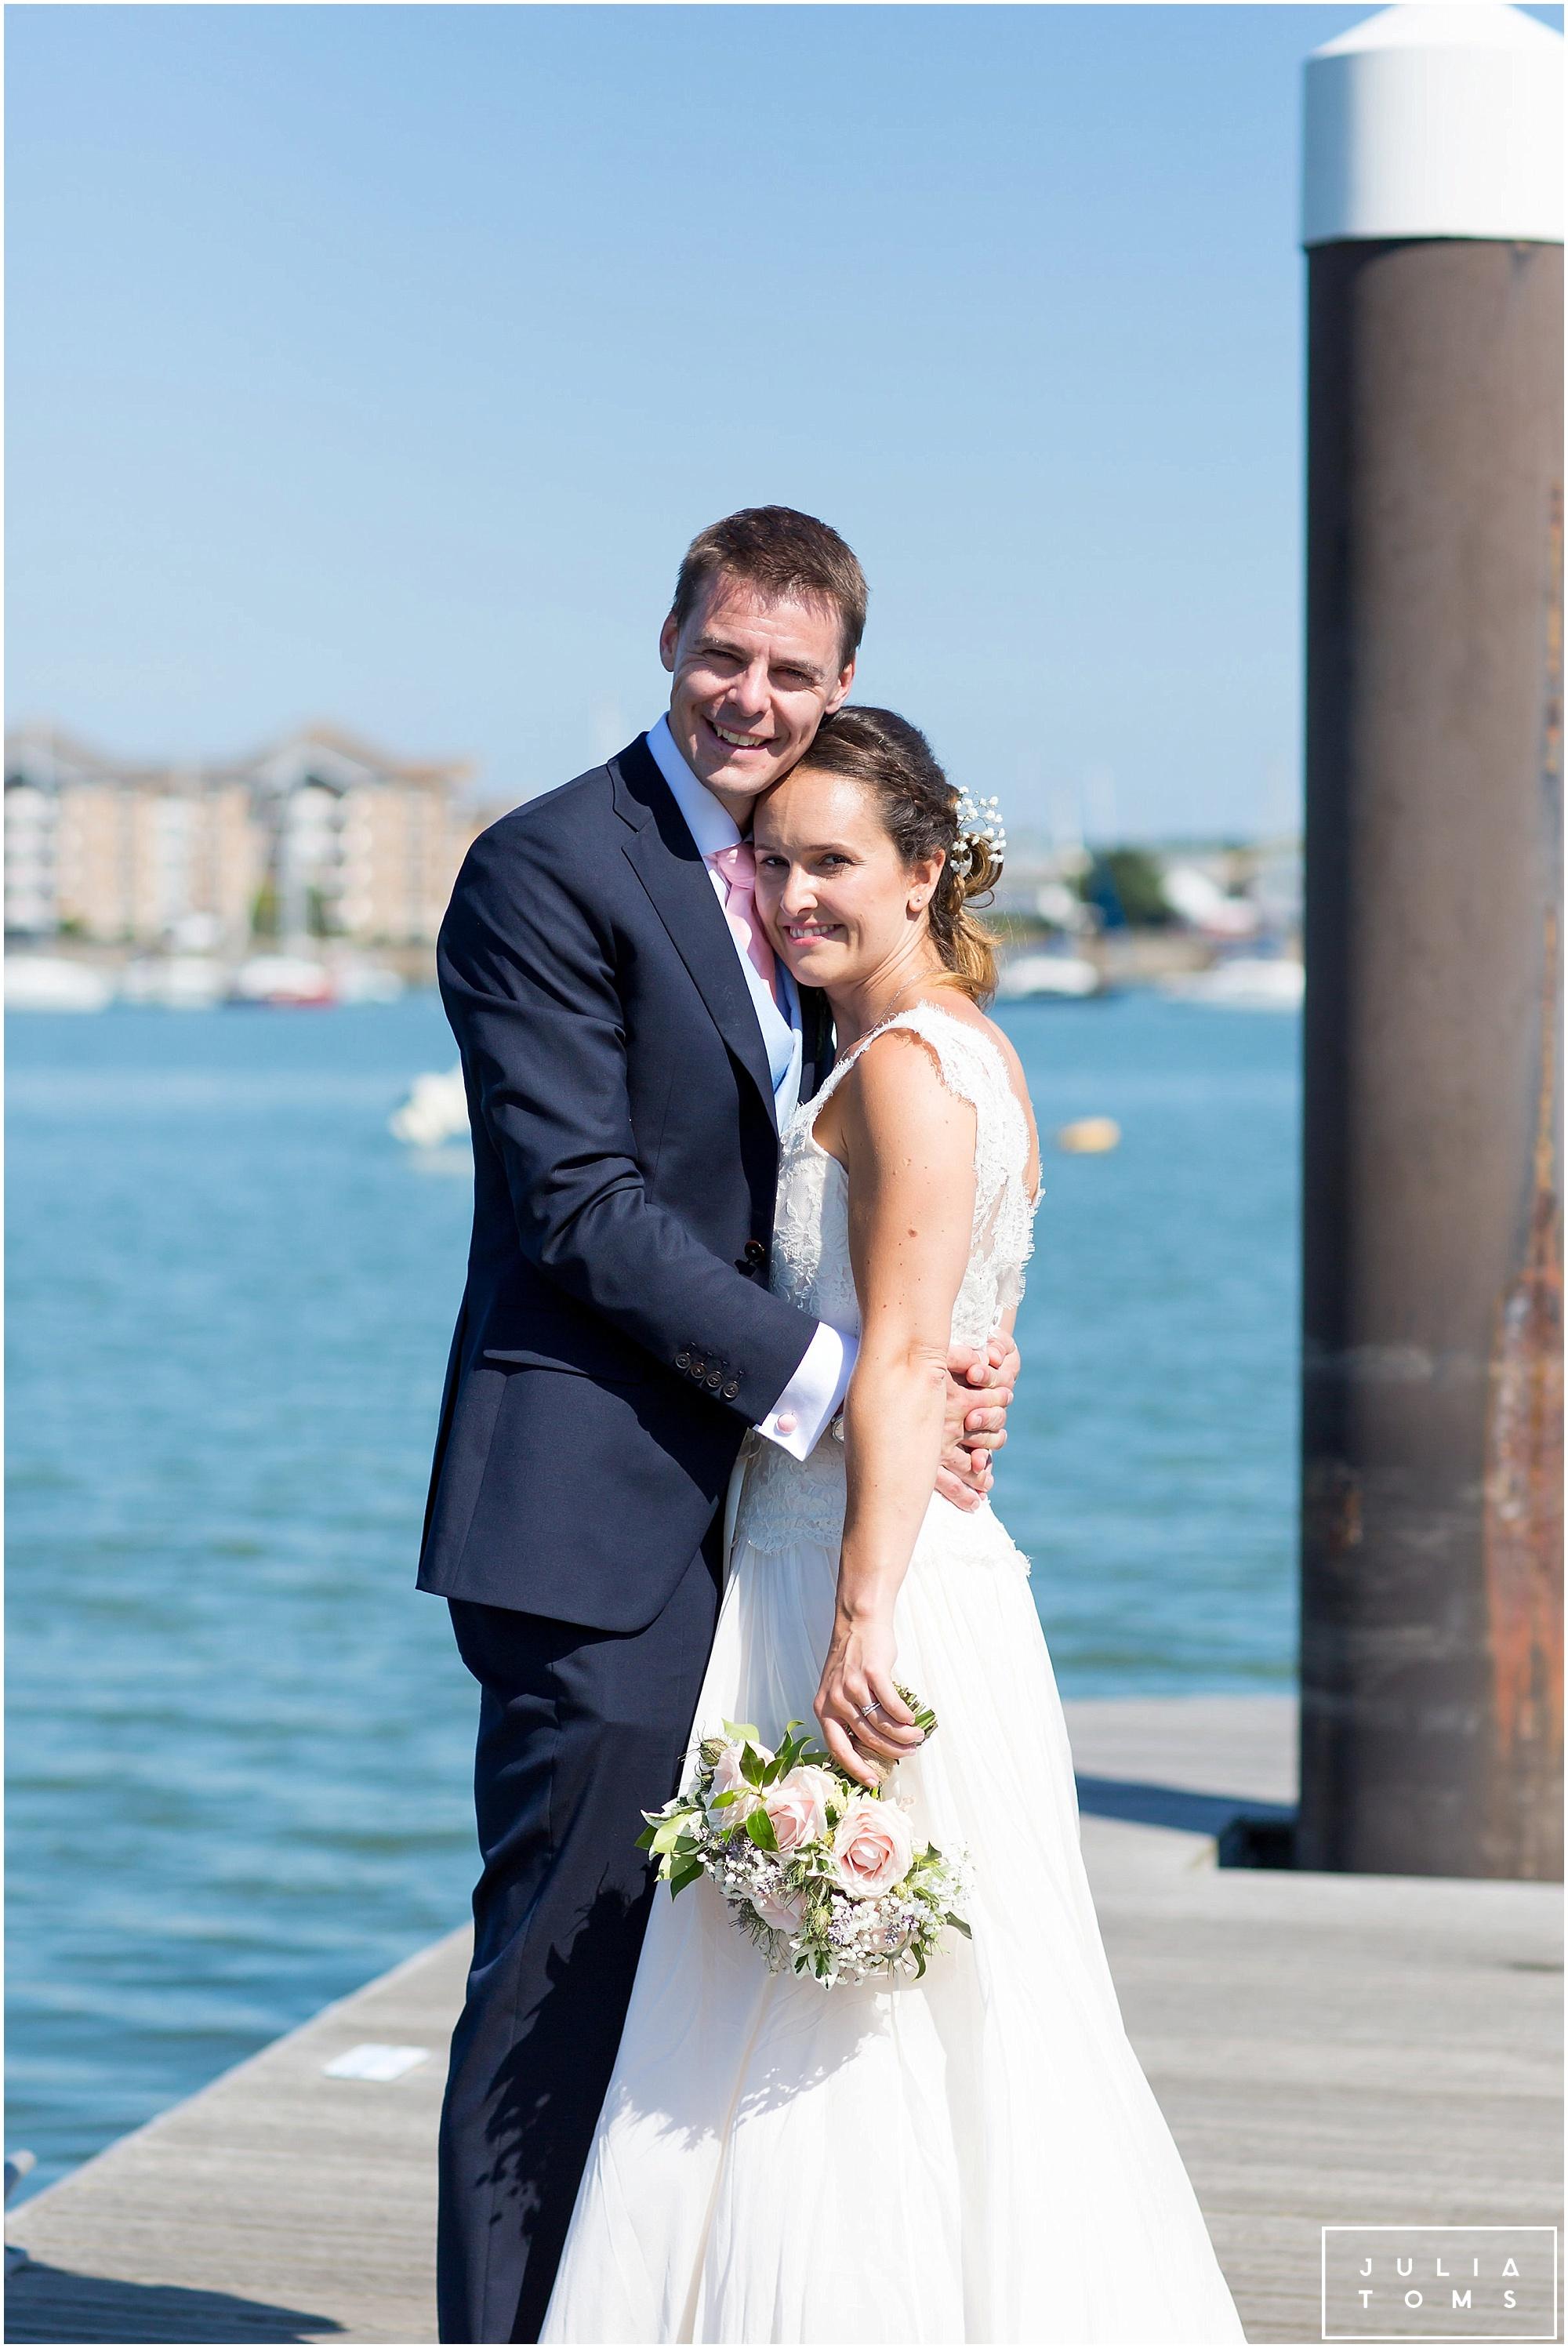 julia_toms_chichester_wedding_photographer_portsmouth_040.jpg